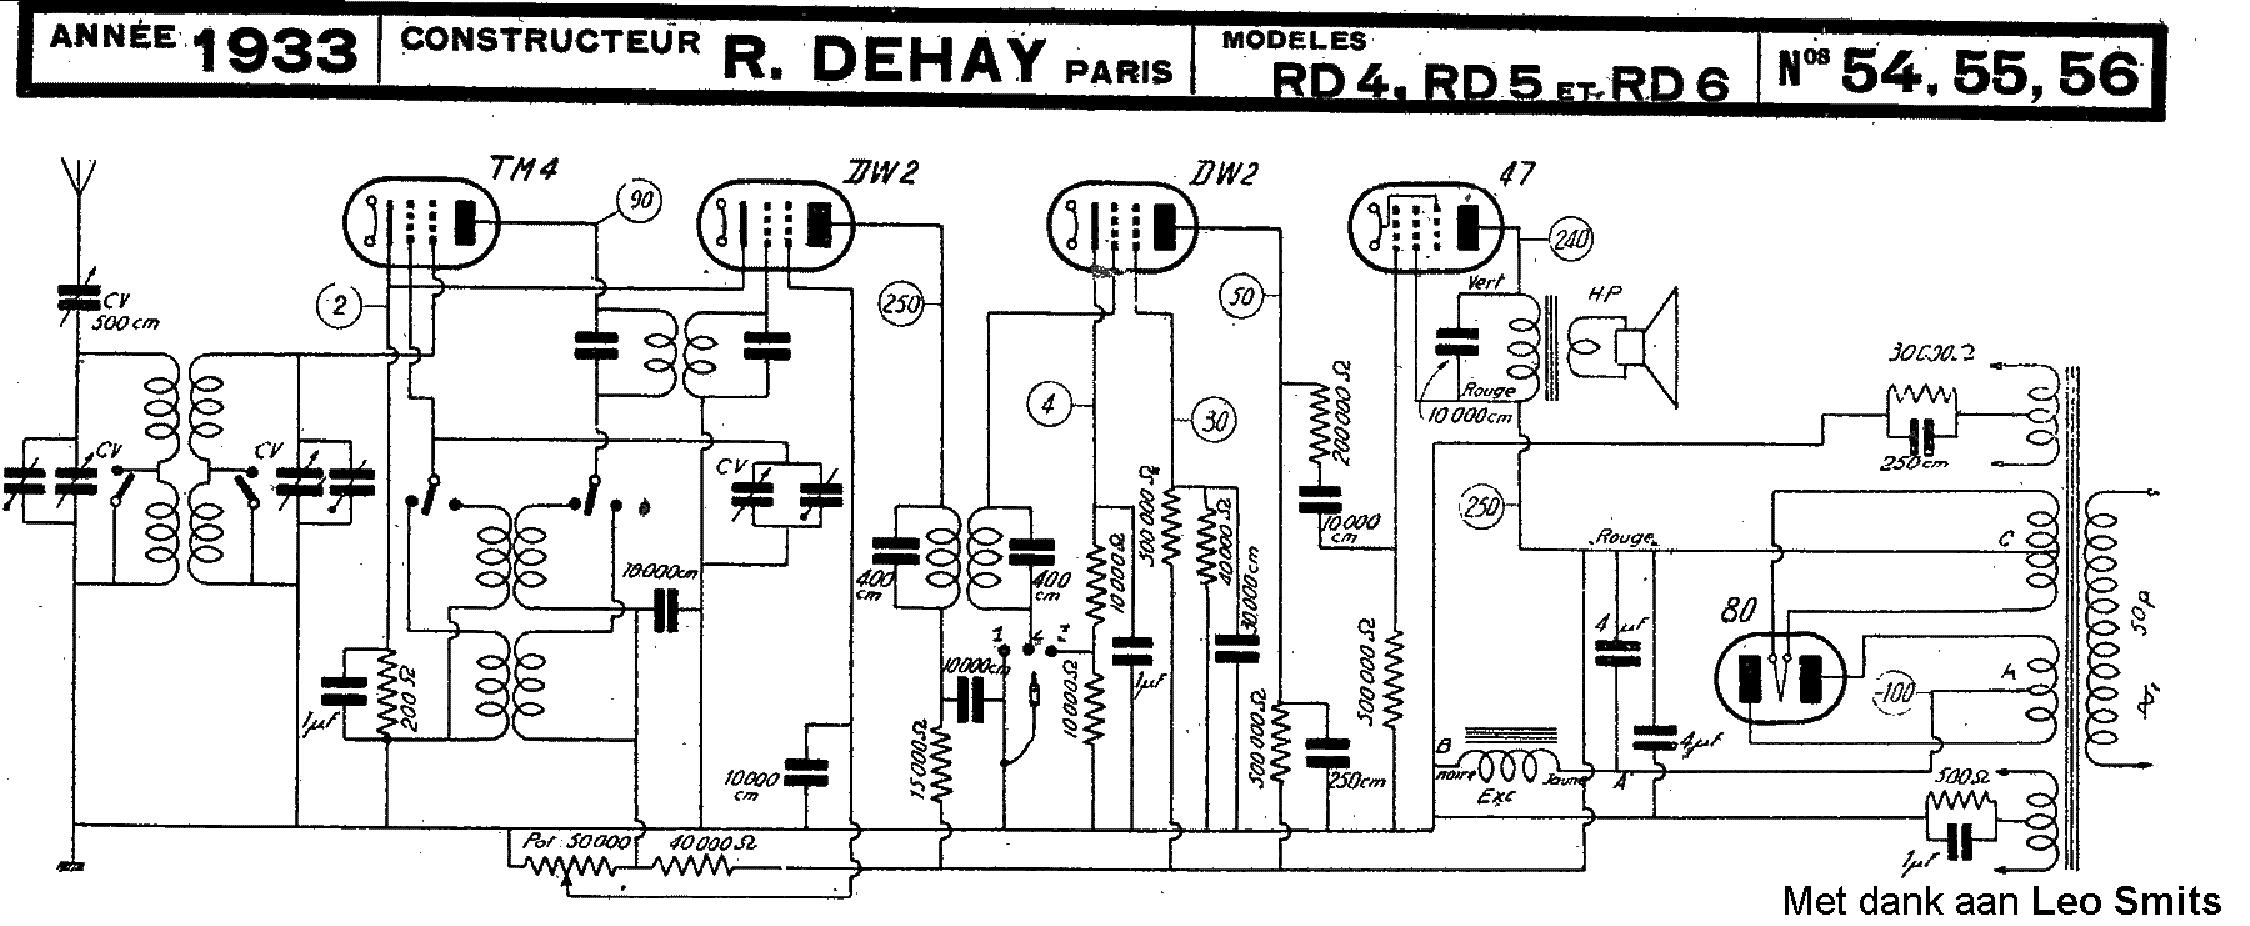 dehay rd4 rd5 rd6 radio 1933 sch service manual download schematics rh elektrotanya com rd4 radio user manual rd4 radio user manual